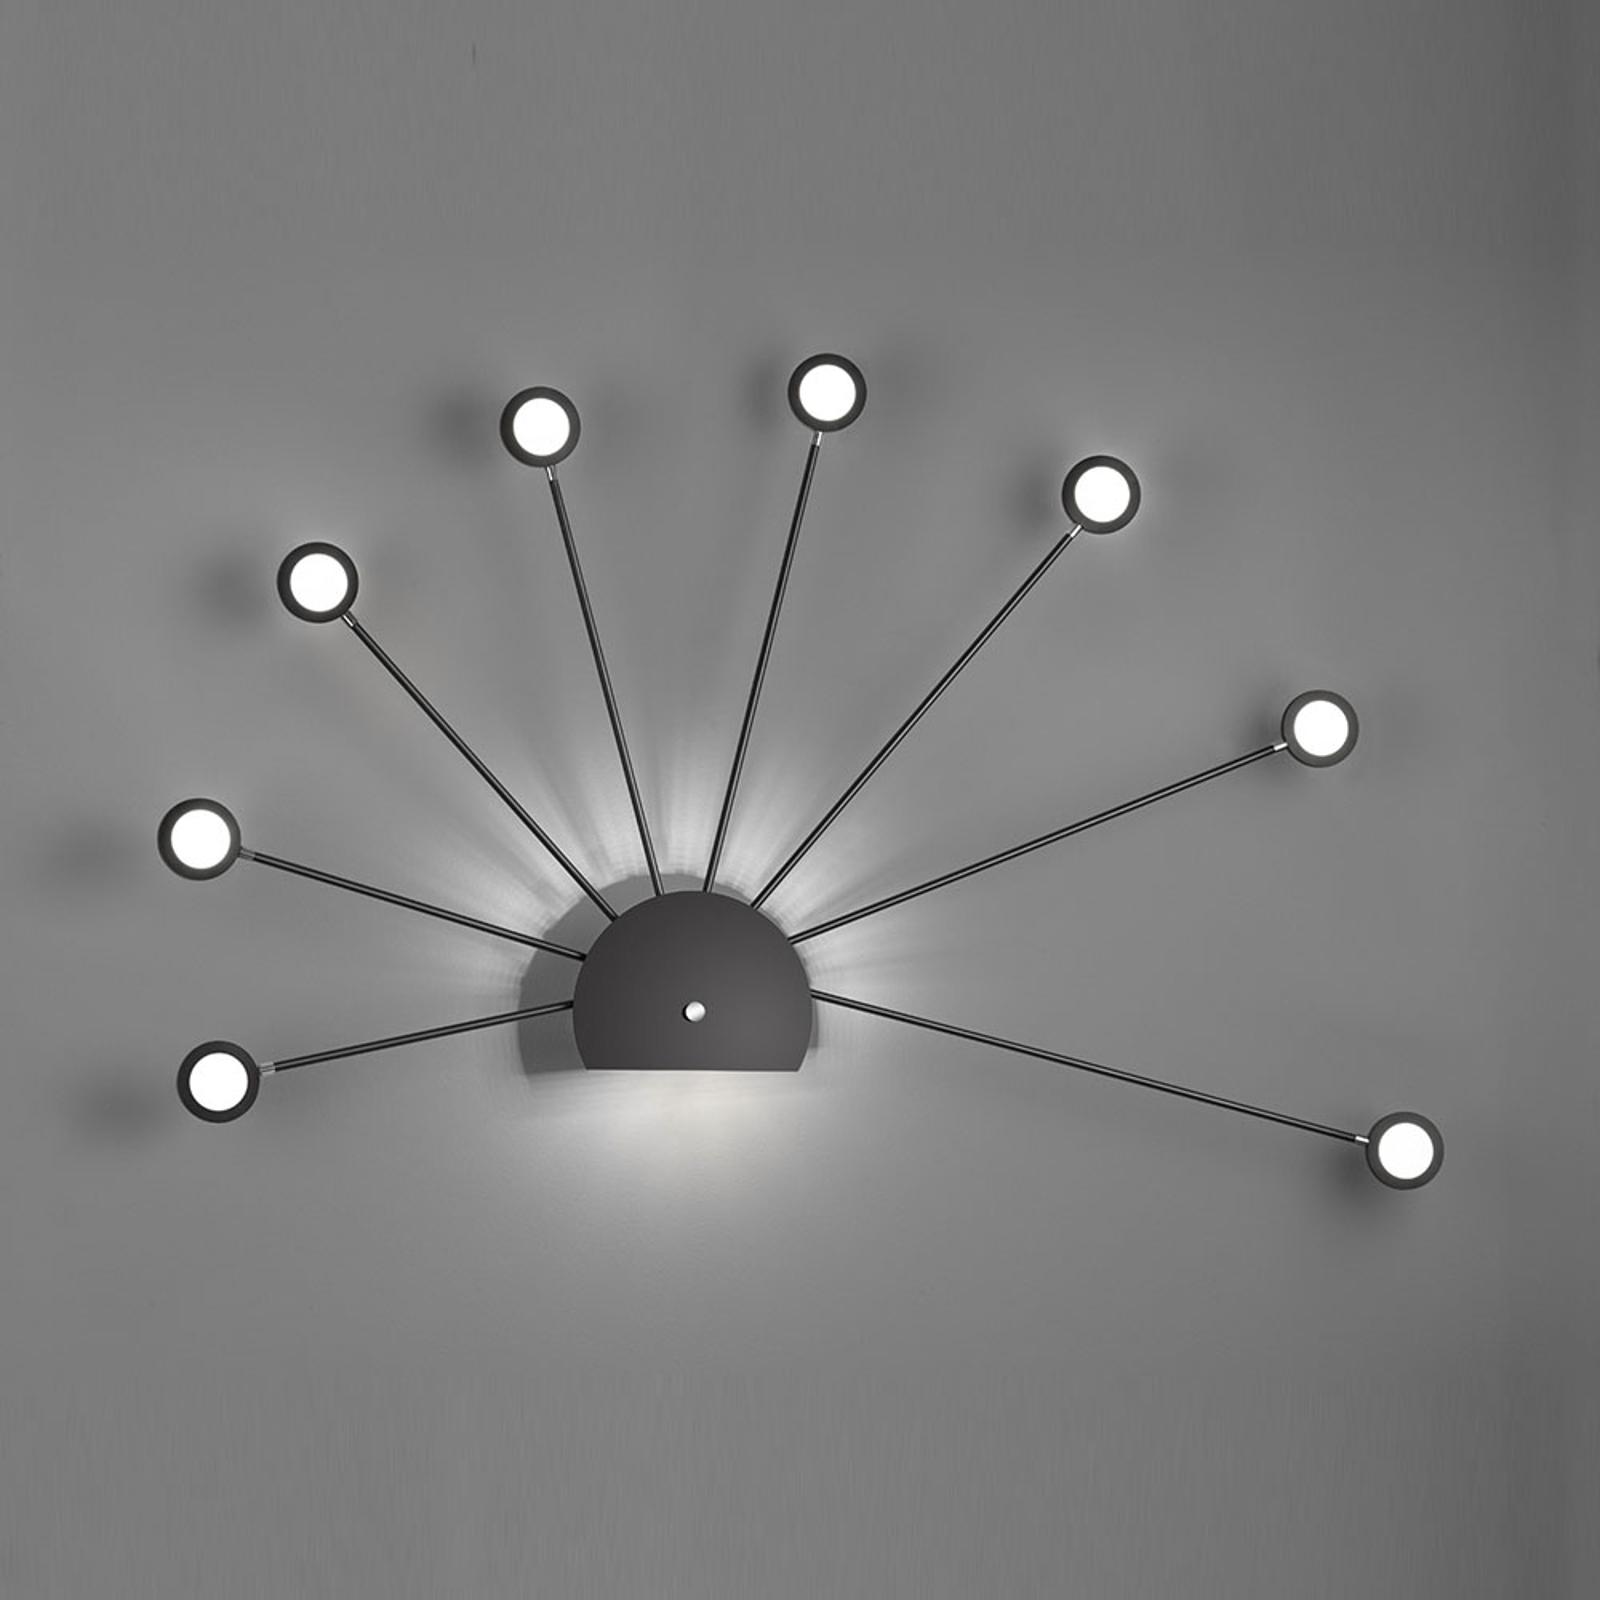 Applique LED Peacock, neuf lampes, noire